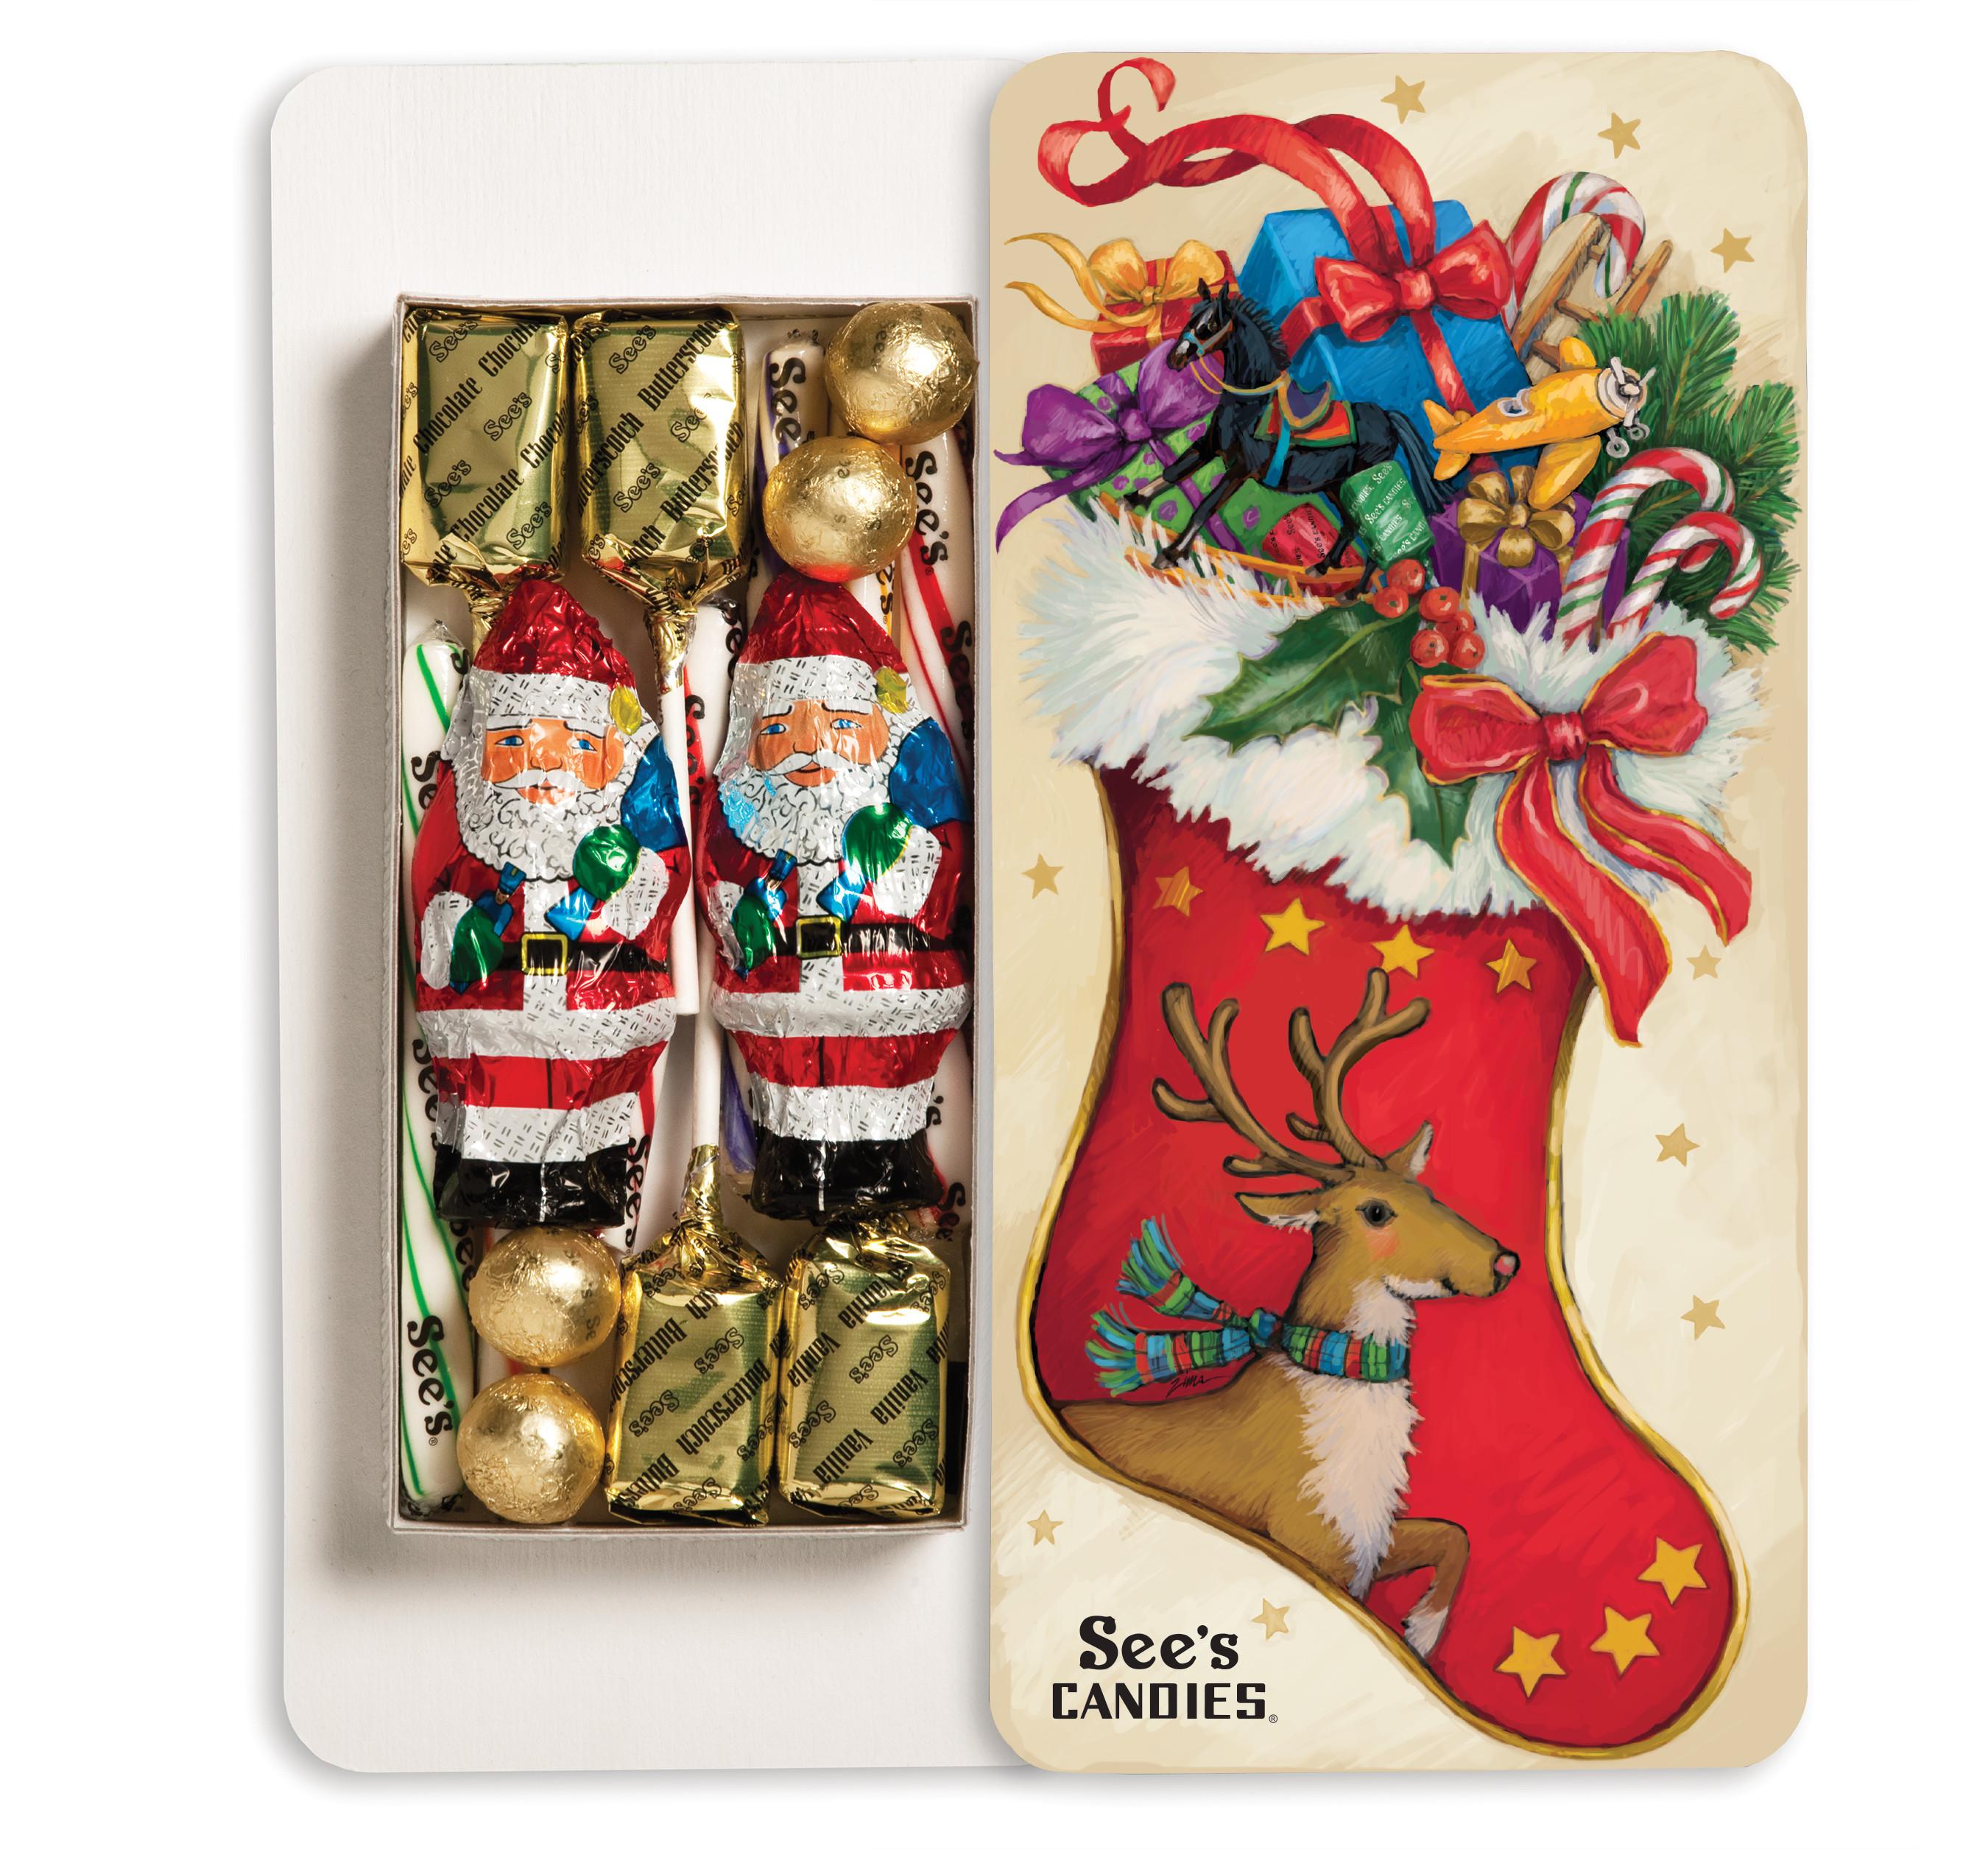 Sees sweet-stocking-box-537-candy-box.jpg